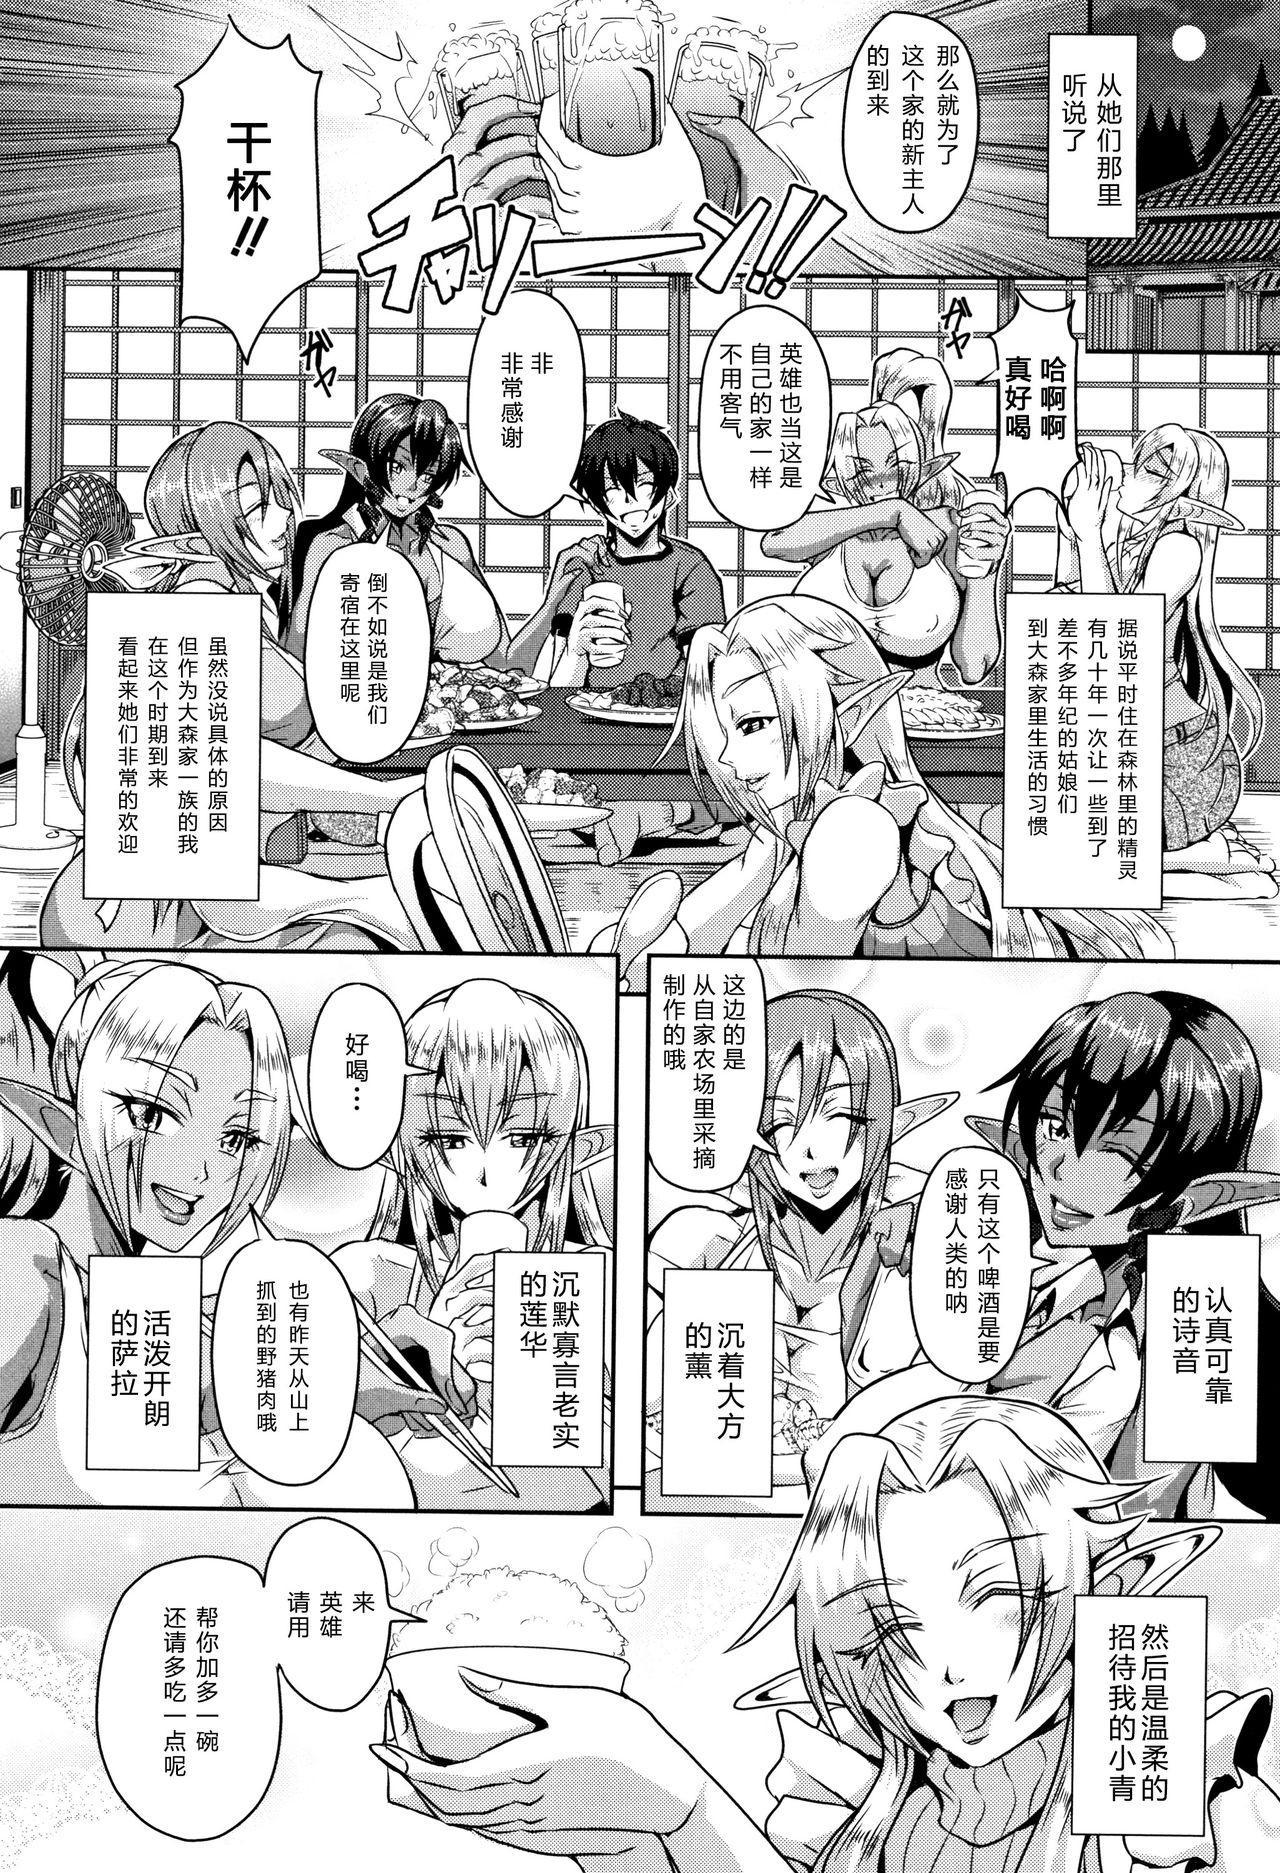 Elf Harem no Mori to Kozukuri Keiyaku | 妖精后宮生子契約 9